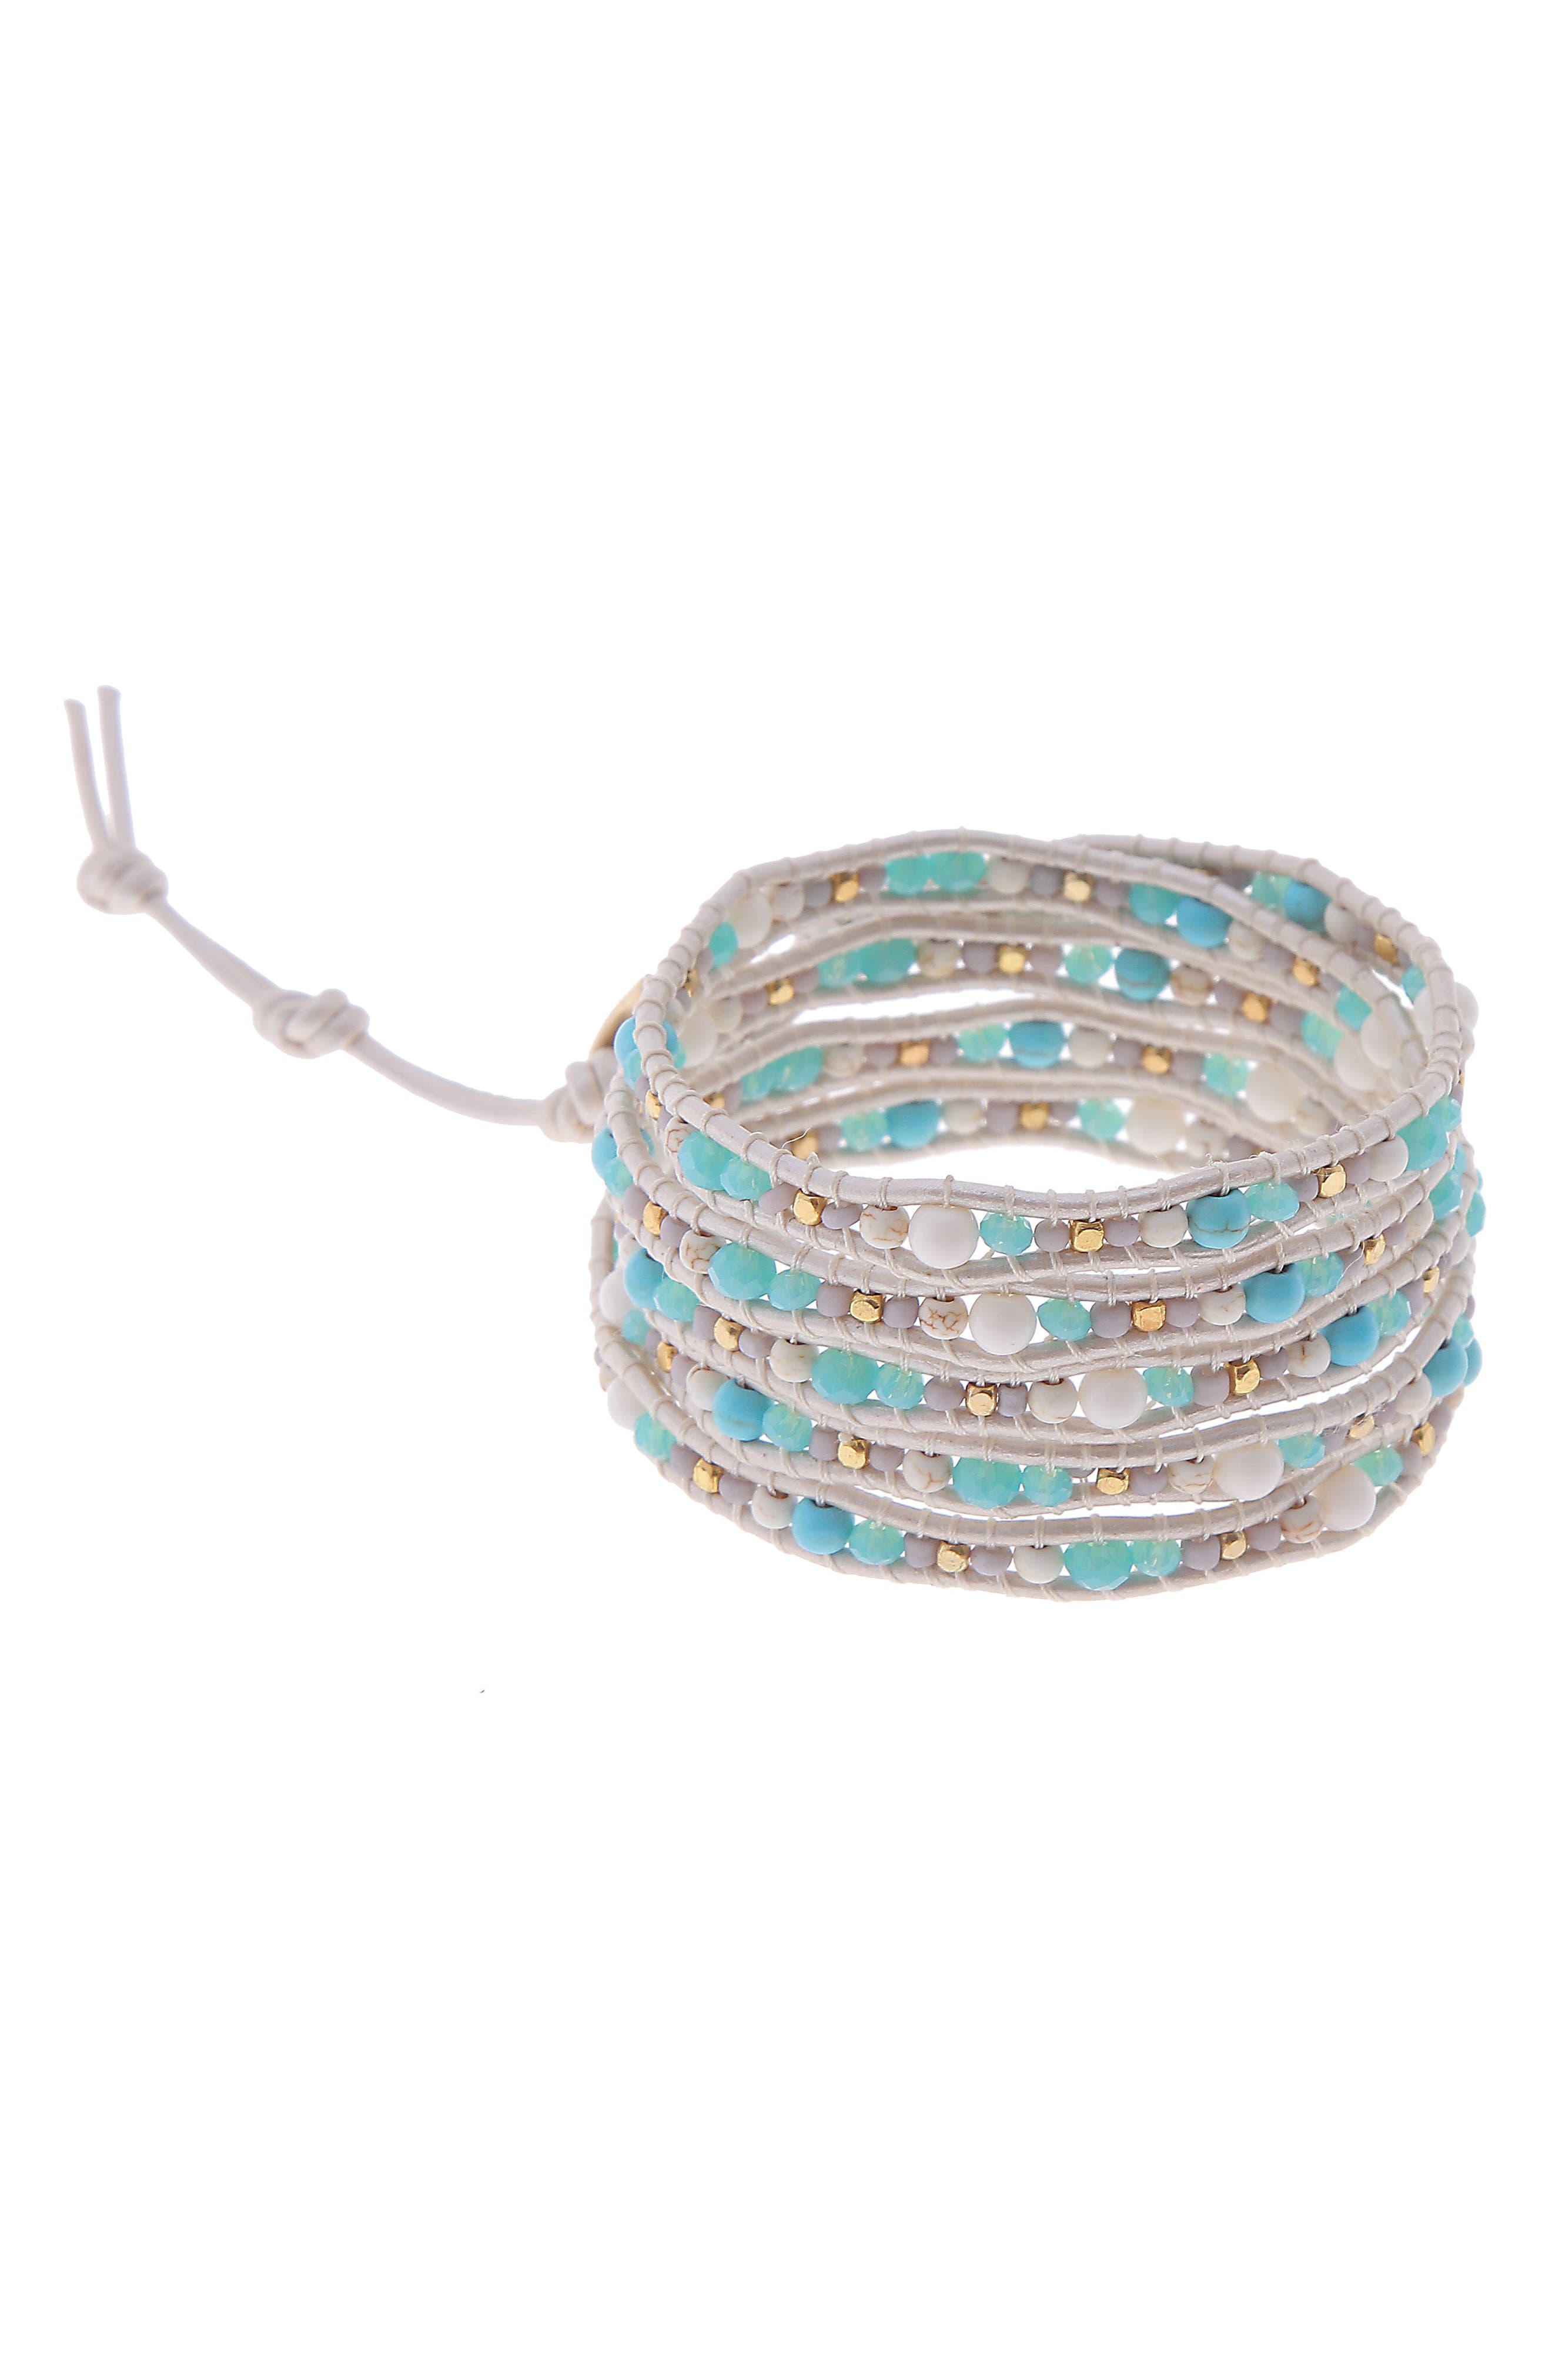 Stone & Metal Wrap Bracelet,                             Main thumbnail 1, color,                             400